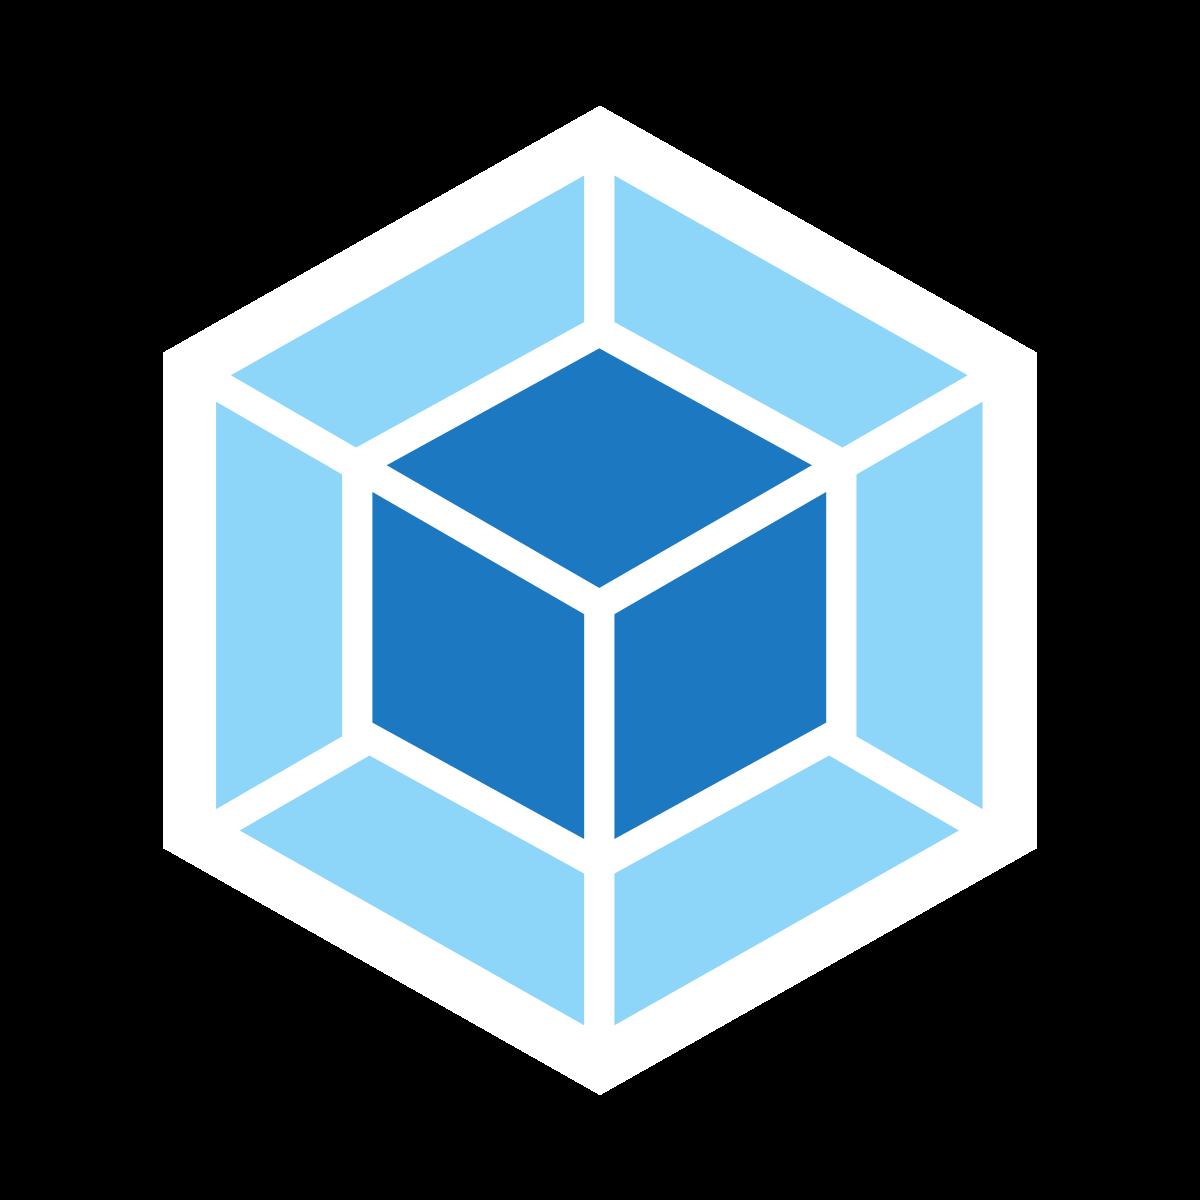 CubeMC Logo